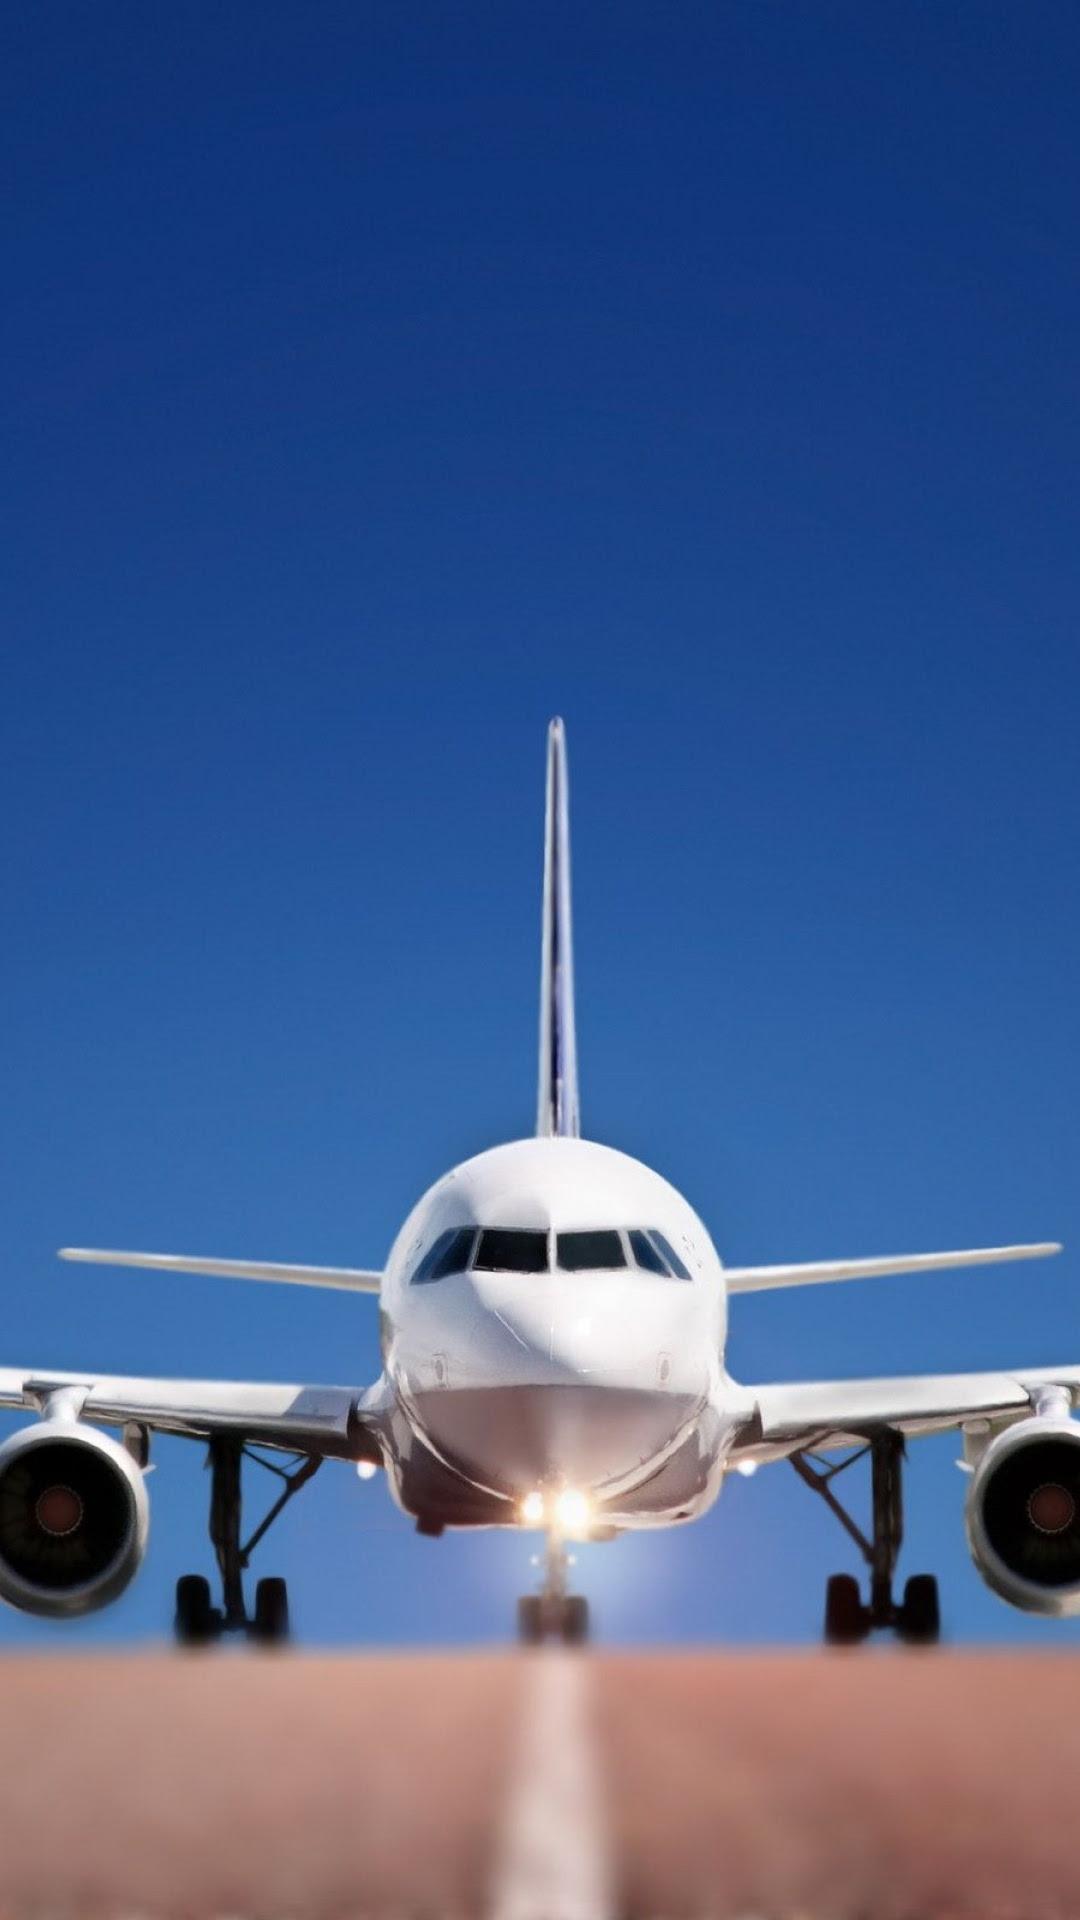 Airplane Iphone Wallpaper Download Free | PixelsTalk.Net